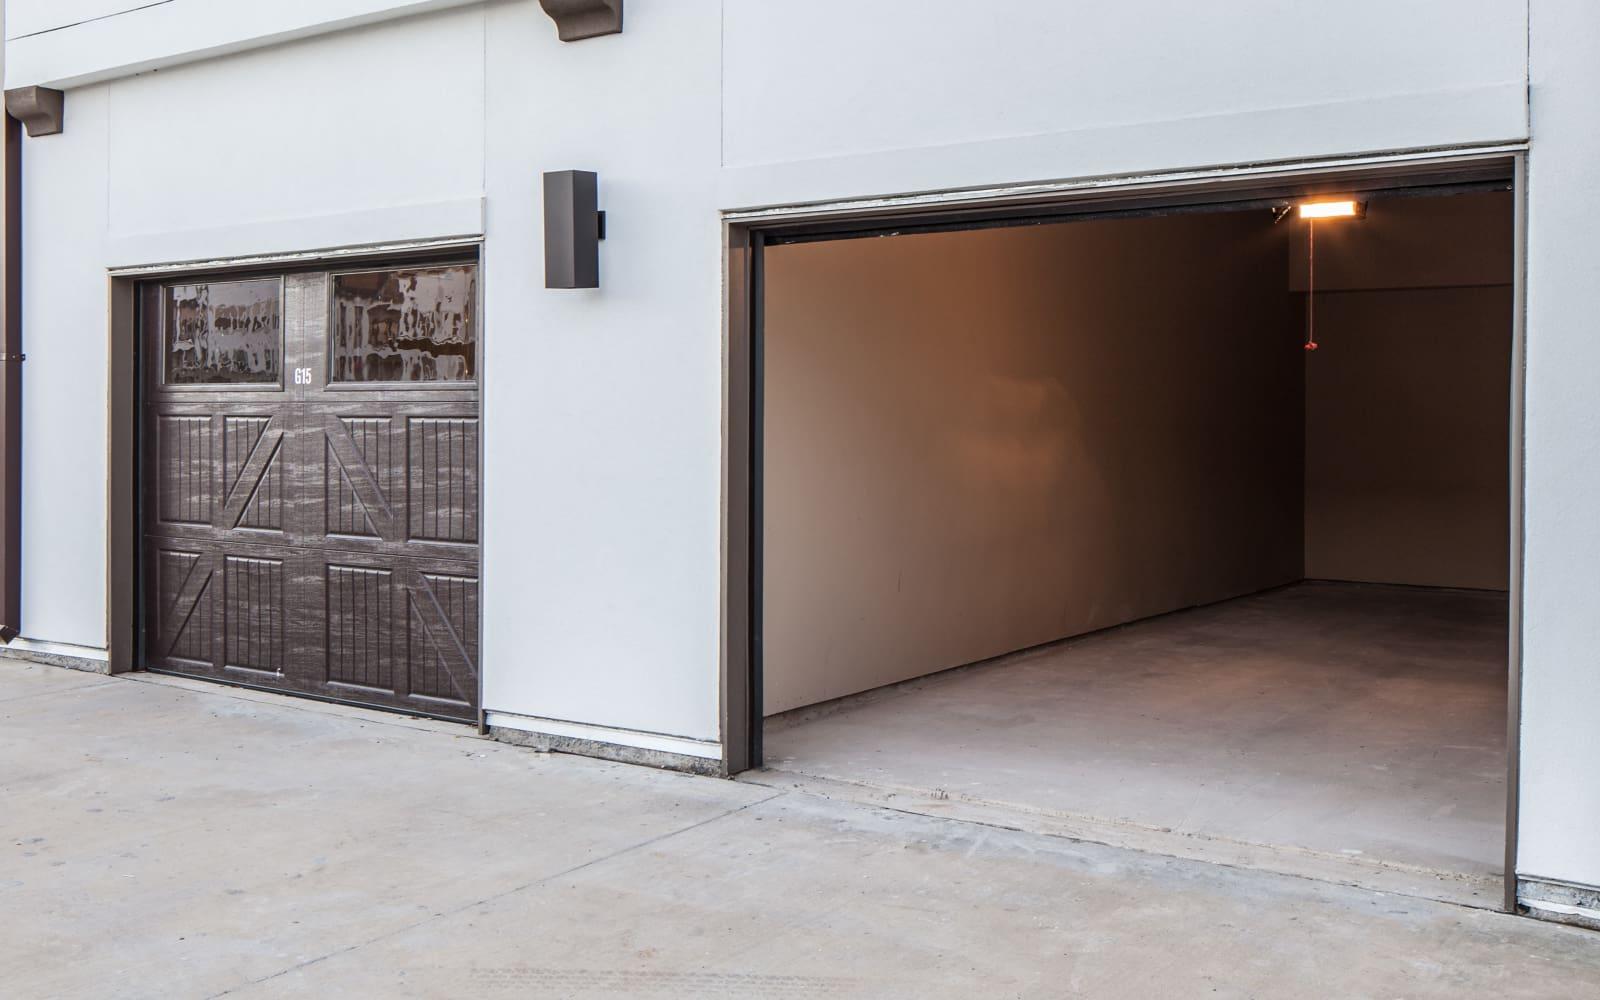 Garage at The High Grove in Baton Rouge, Louisiana